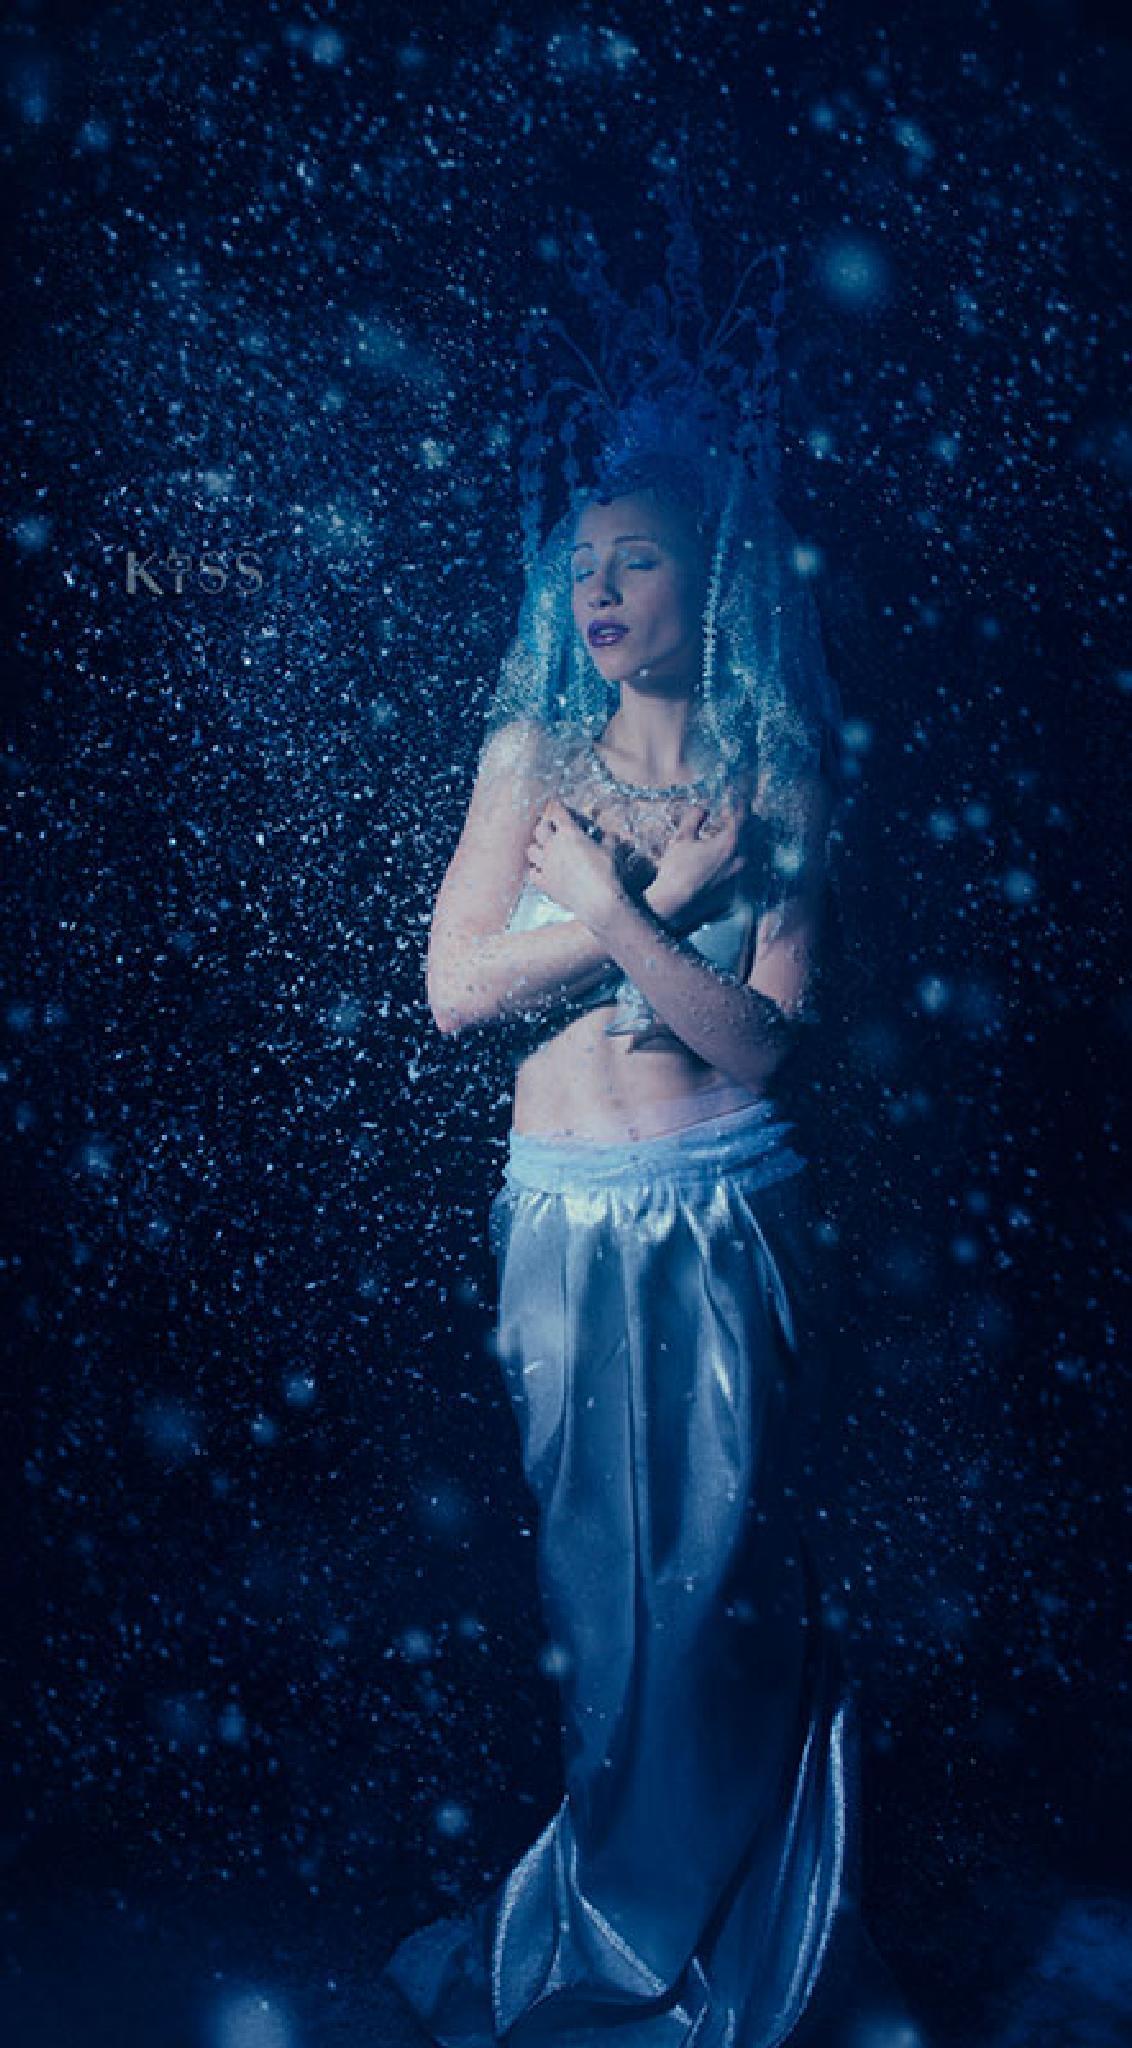 Winter wonderland by KissPhotography